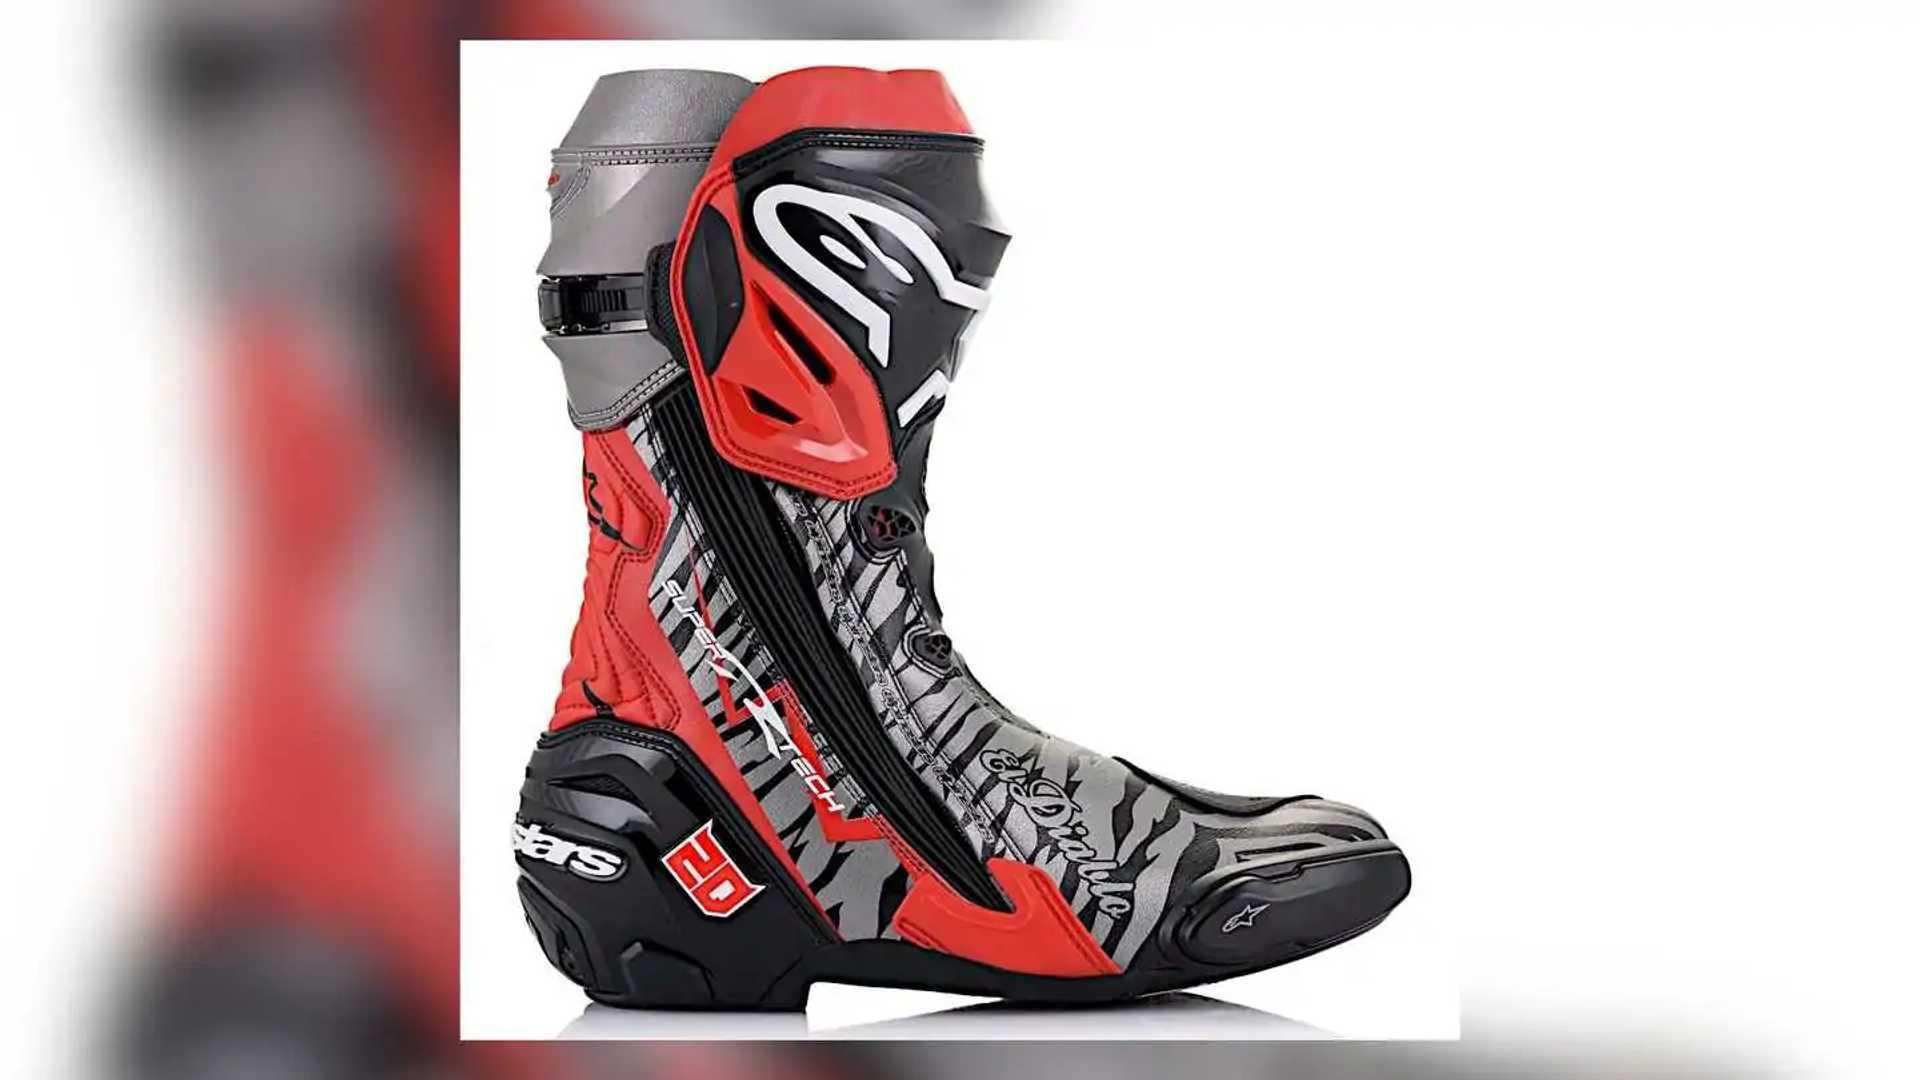 Alpinestars Limited Edition El Diablo Supertech R Right Boot Exterior